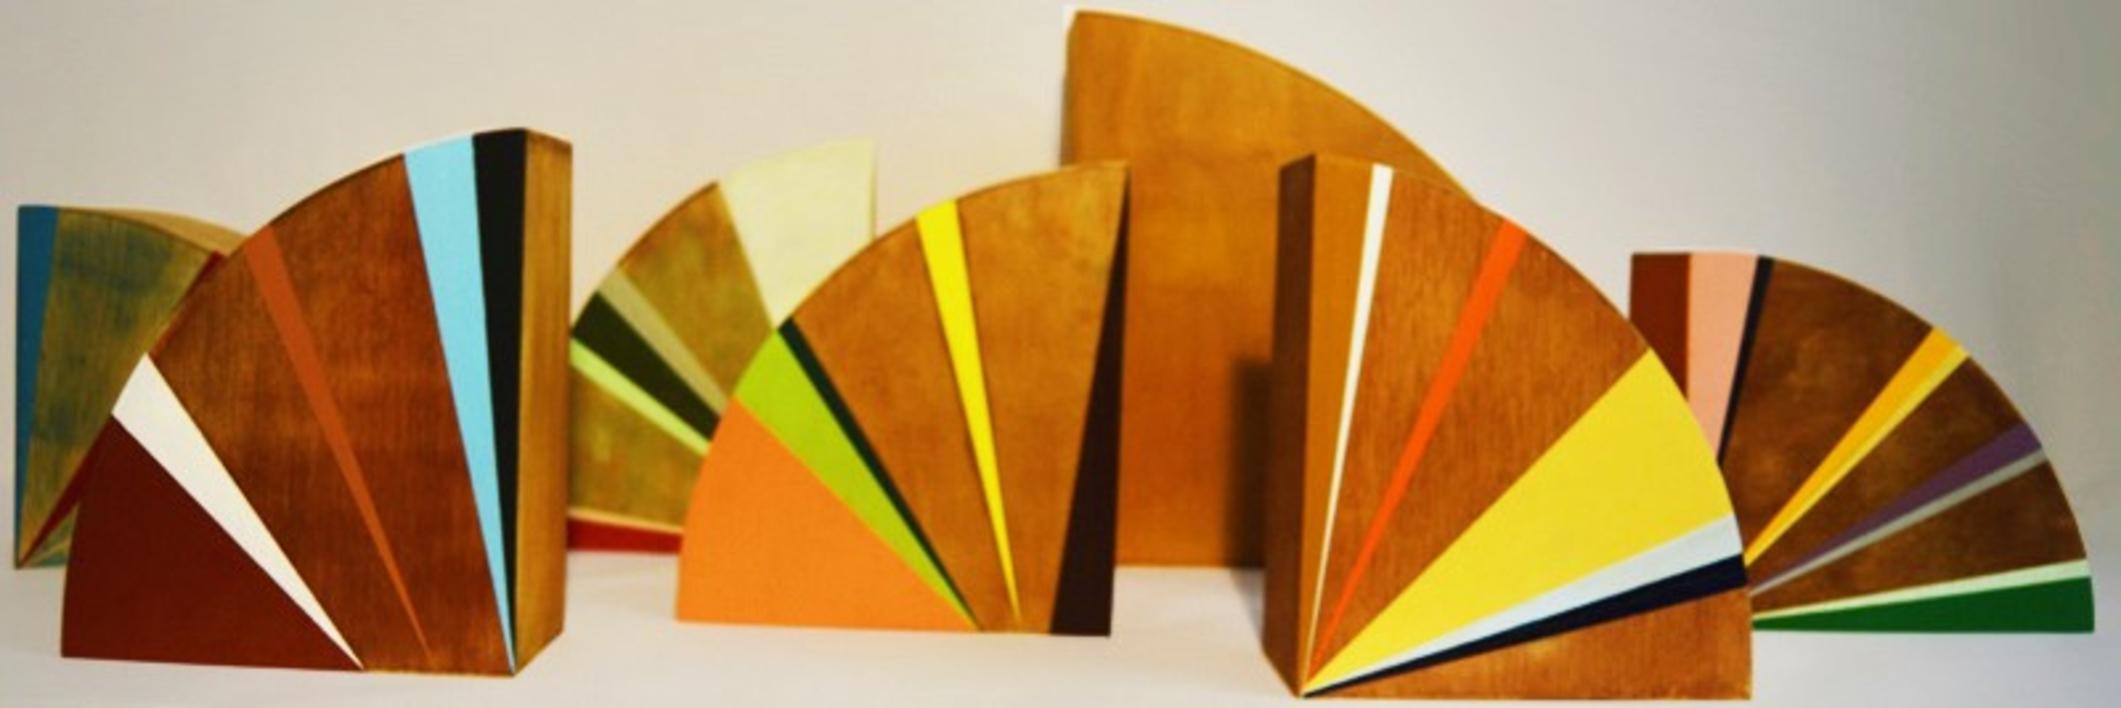 Gradientes |Escultura de Gilles Courbière | Compra arte en Flecha.es